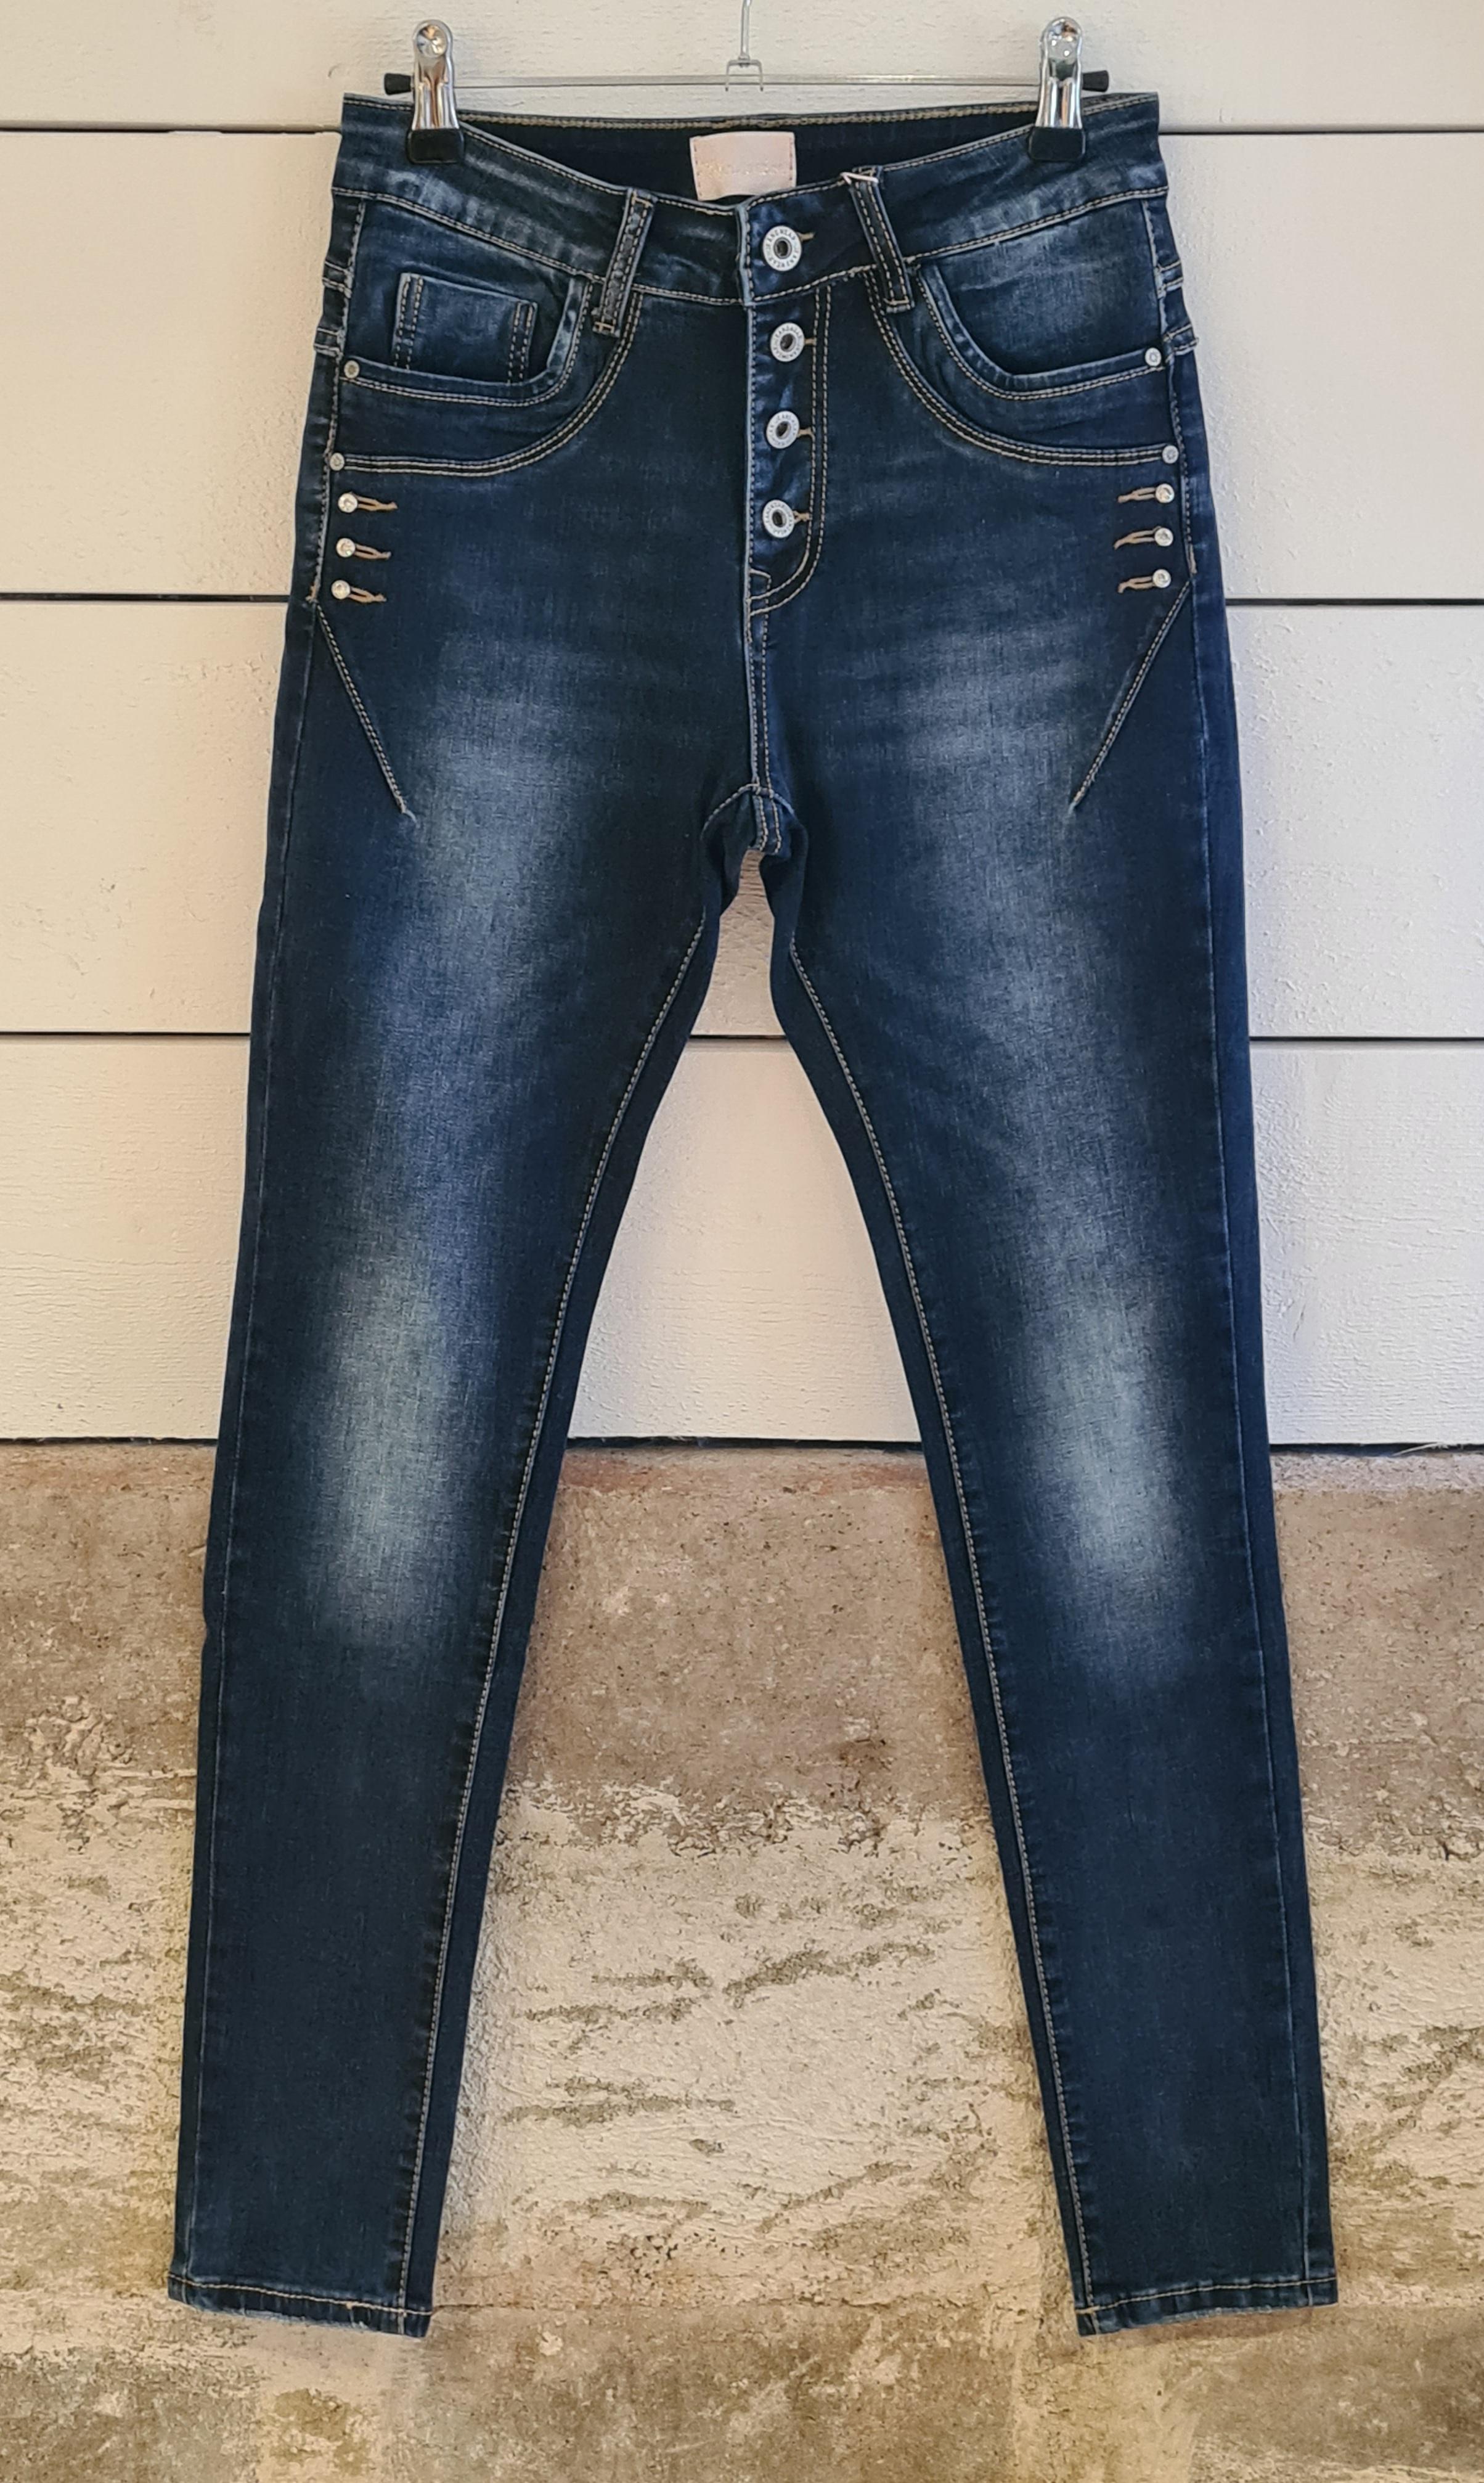 Jeans m bling